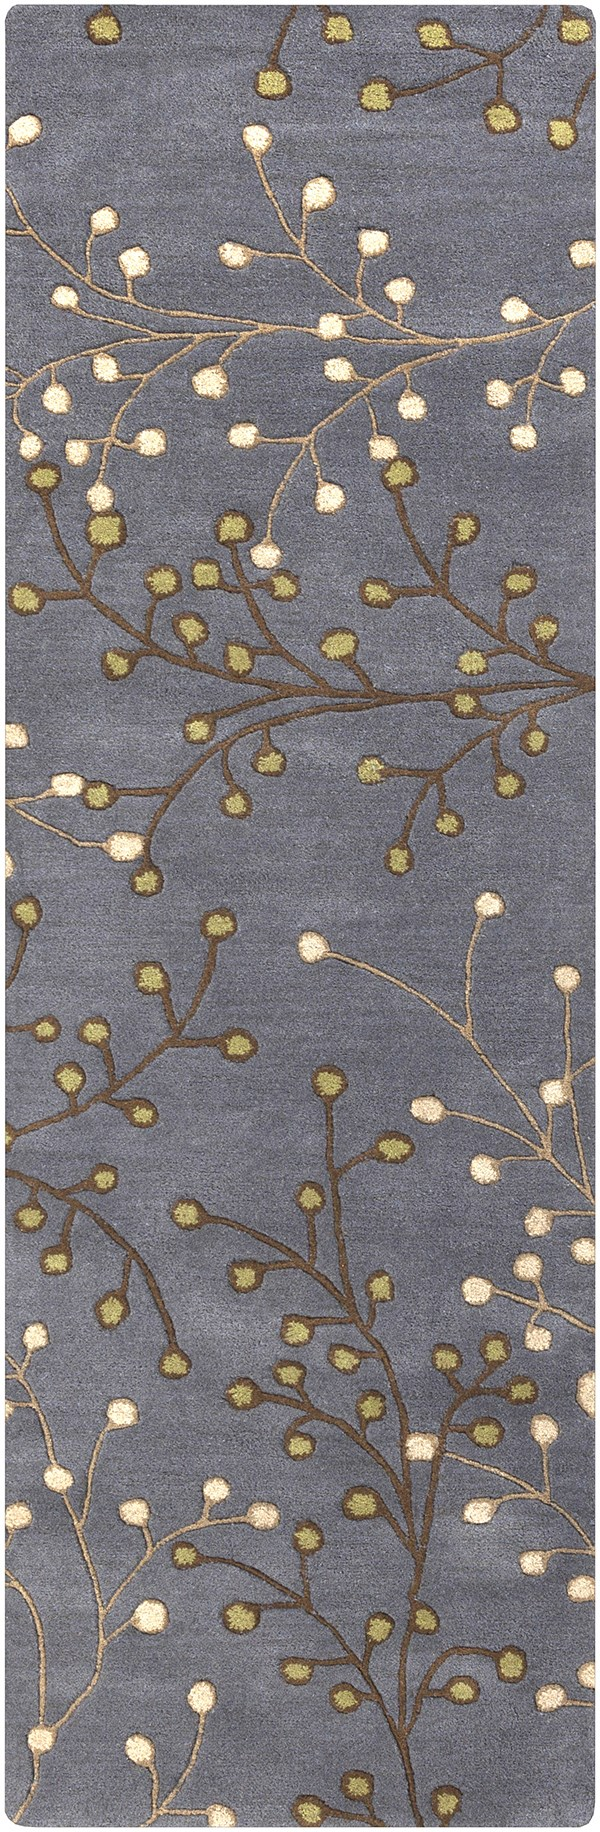 Navy, Dark Brown, Tan, Beige, Green Floral / Botanical Area Rug